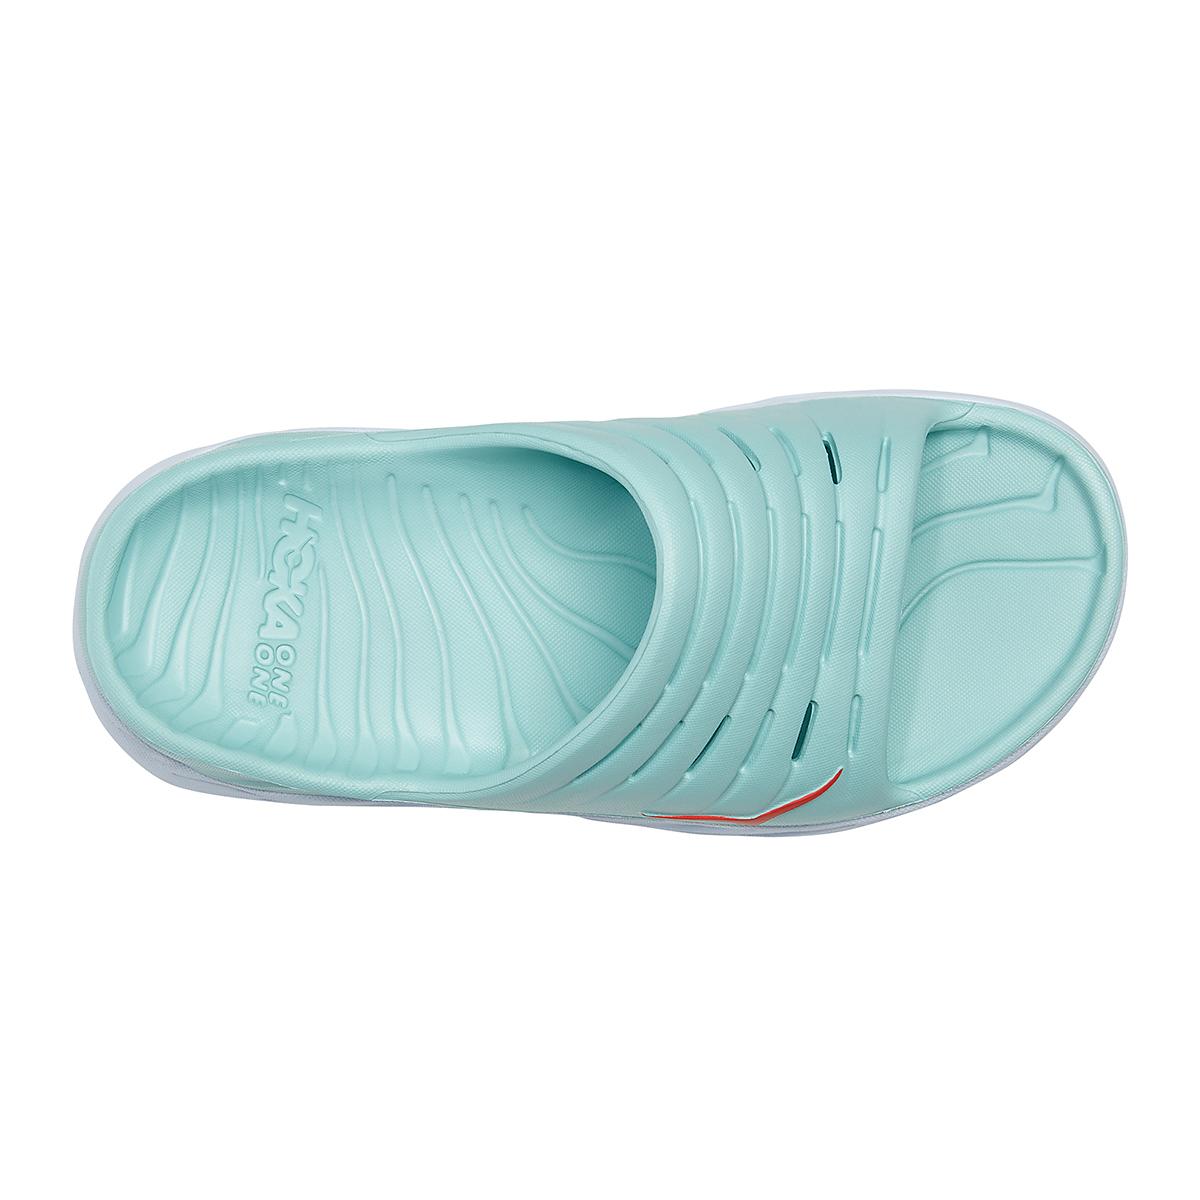 Women's Hoka One One Ora Recovery Slide - Color: Eggshell Blue/White - Size: 5 - Width: Regular, Eggshell Blue/White, large, image 5